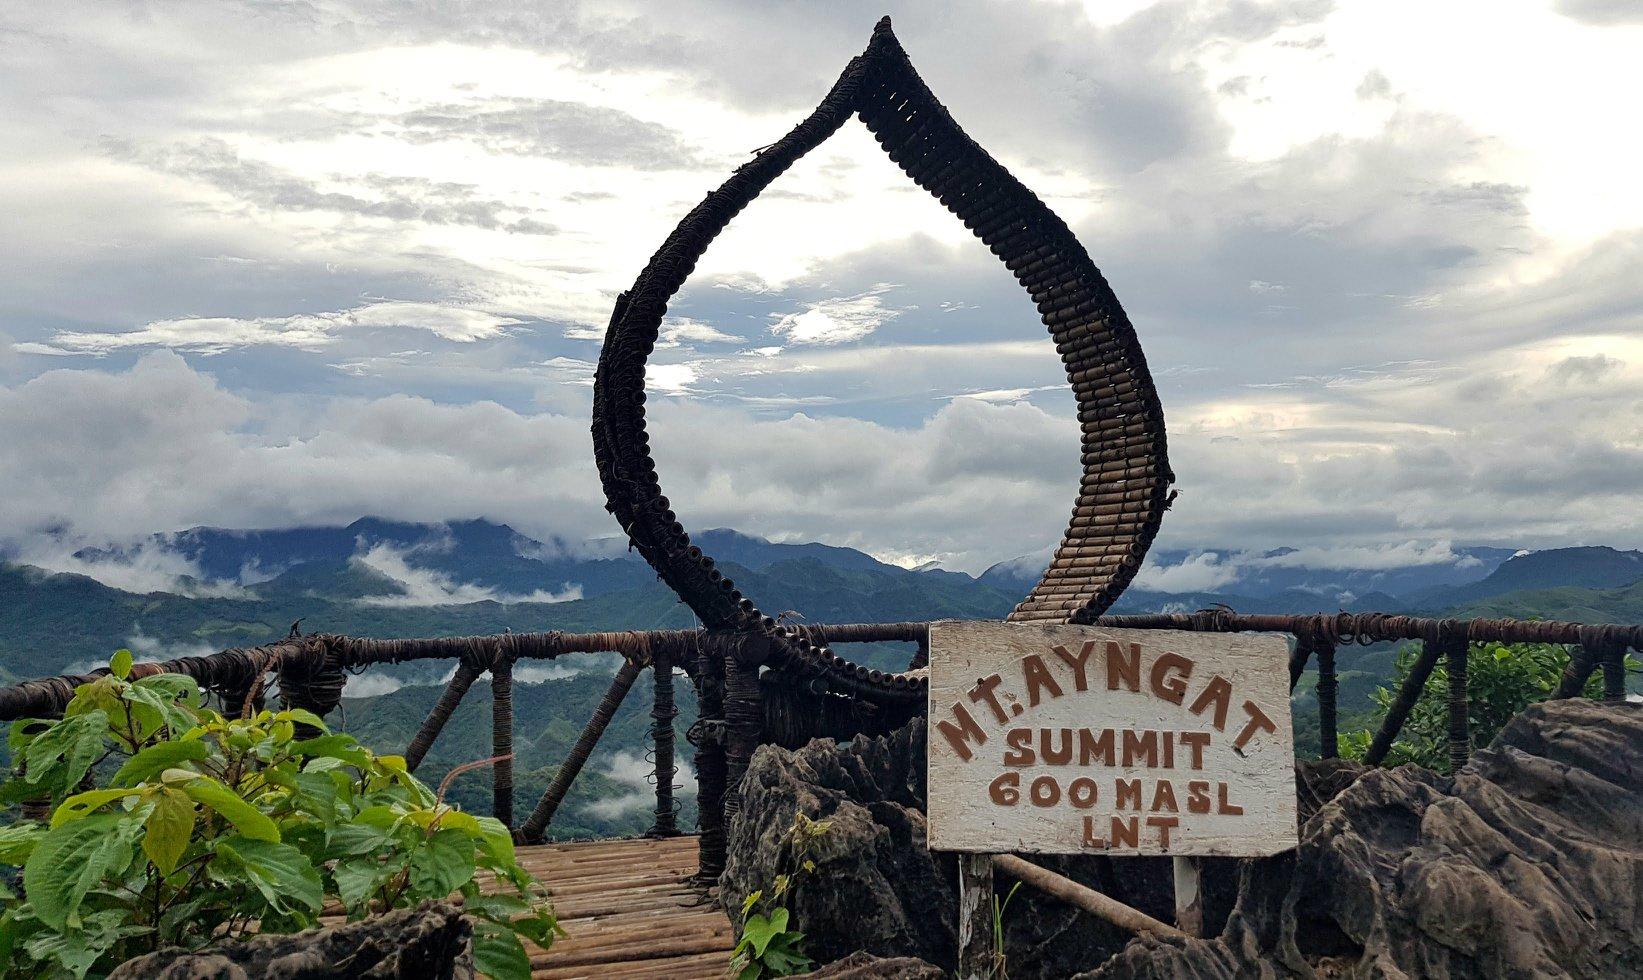 Mt. Ayngat in Rizal